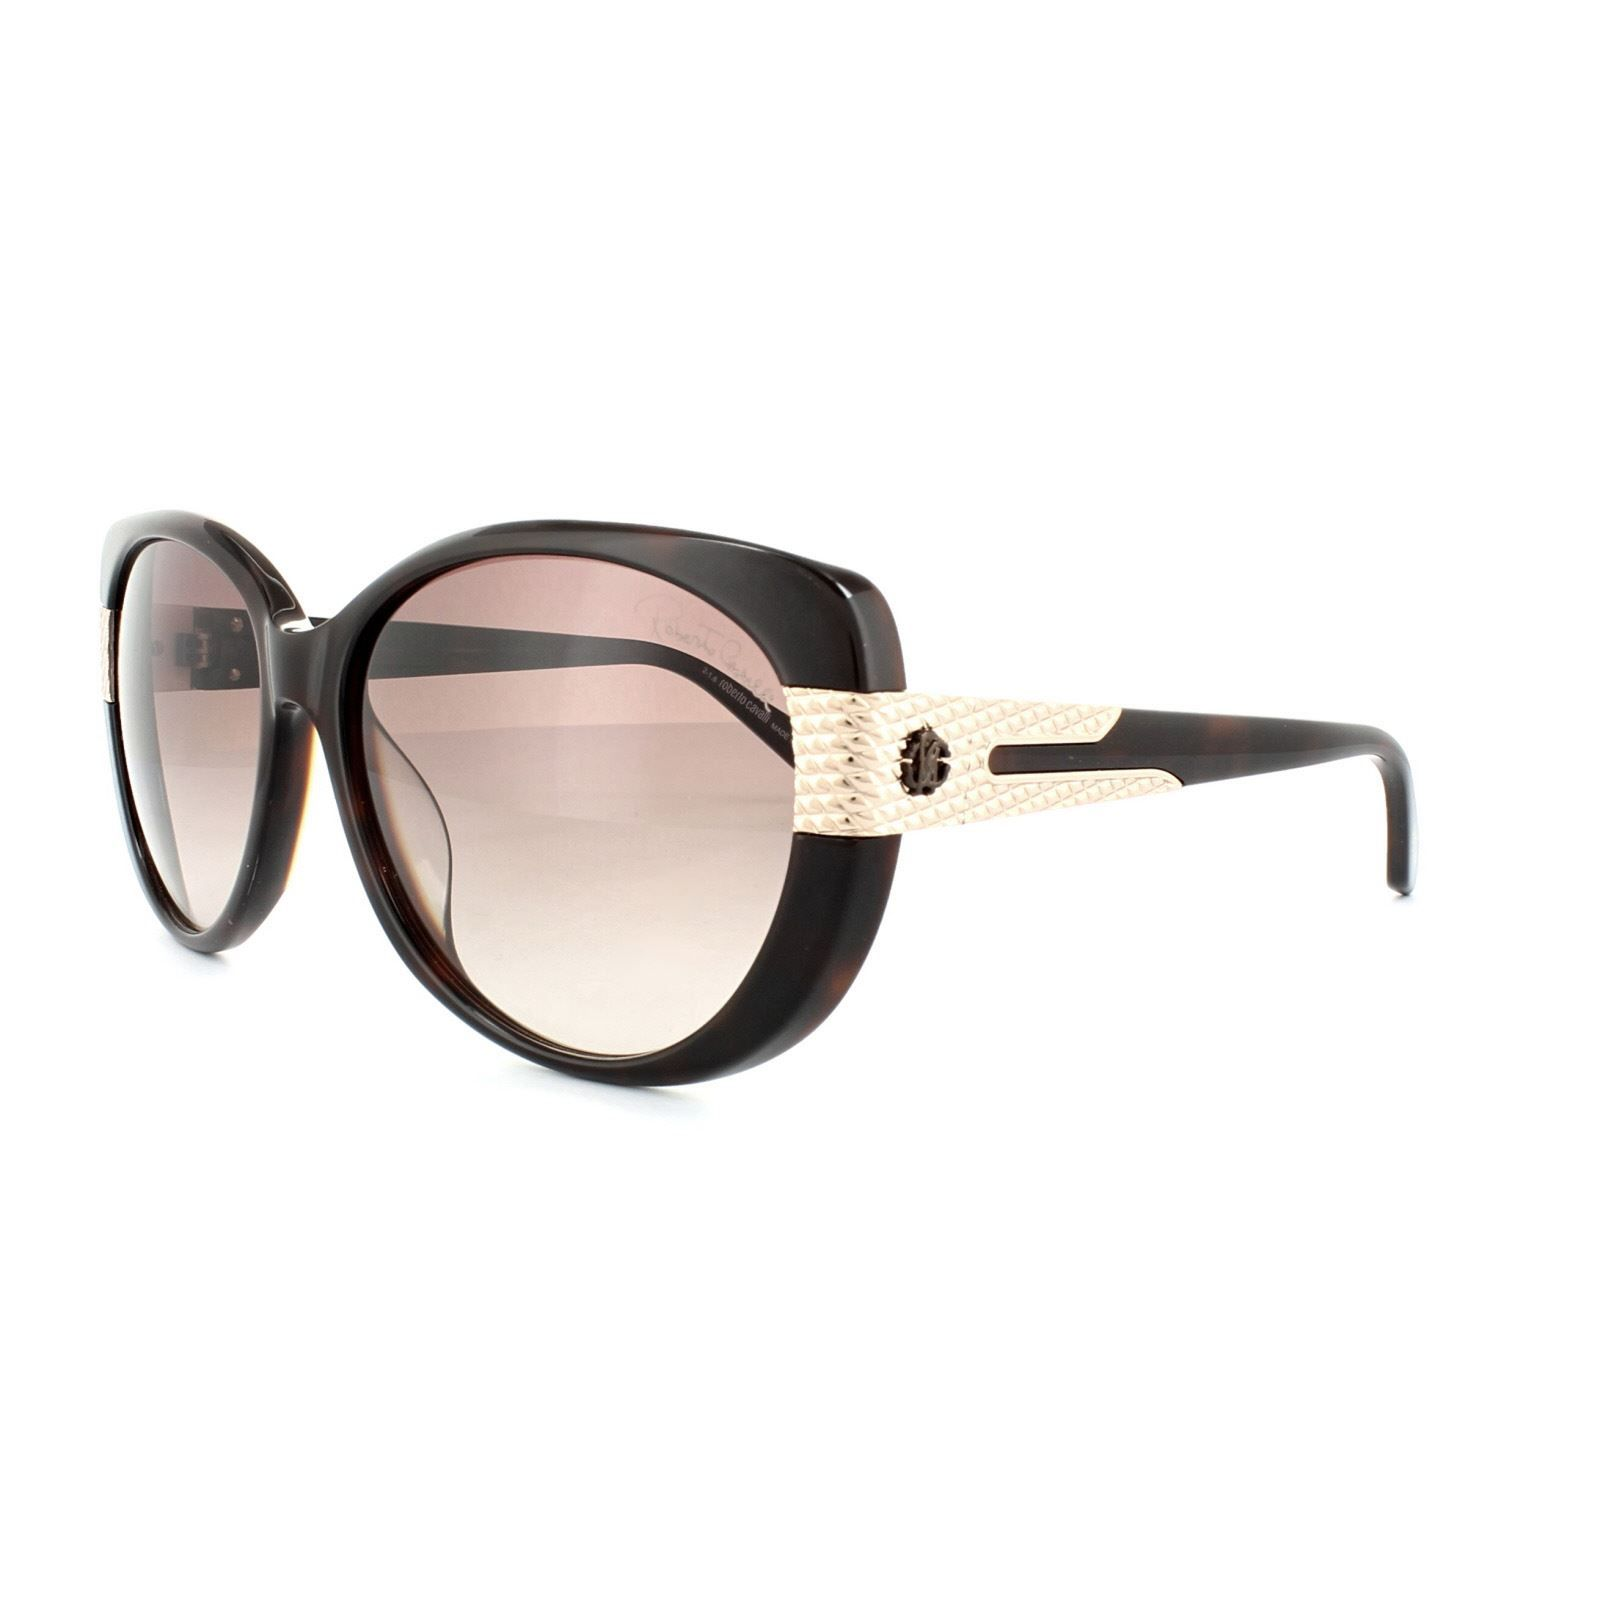 Roberto Cavalli Sunglasses Fesdu 745T 52F Black Grey Gradient